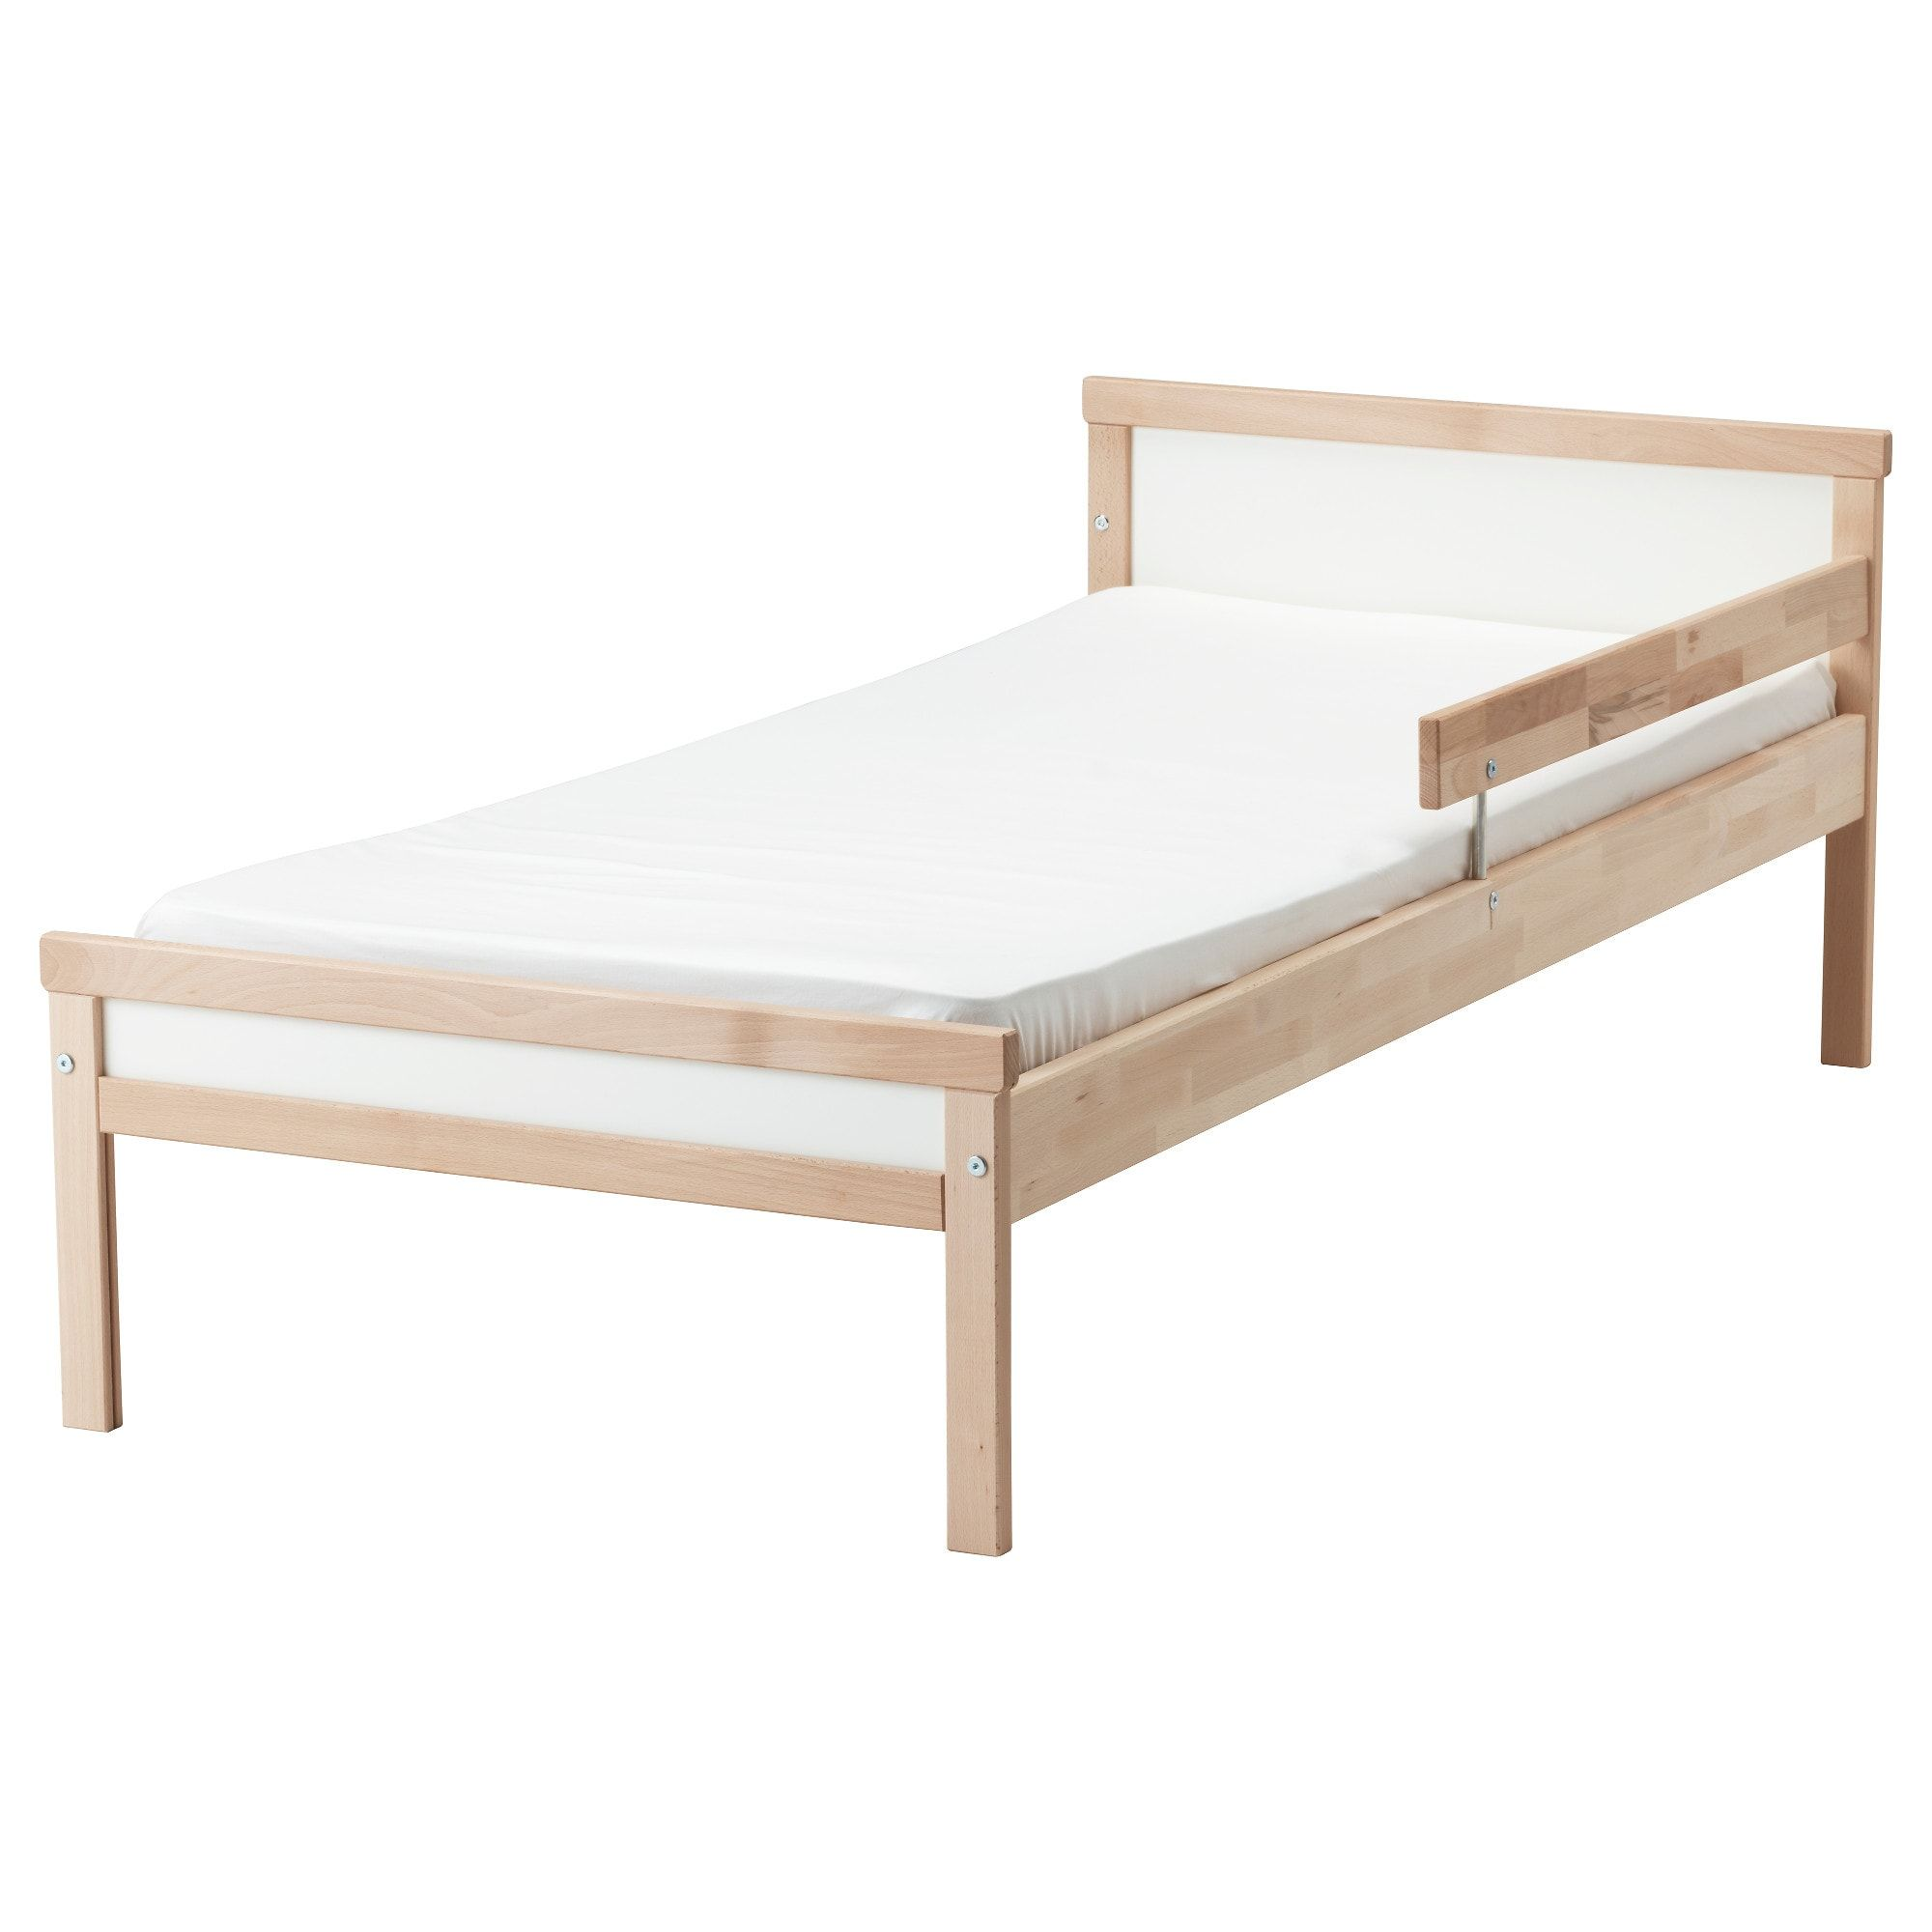 Sniglar Bed Frame With Slatted Bed Base Beech Ikea Ikea Kids